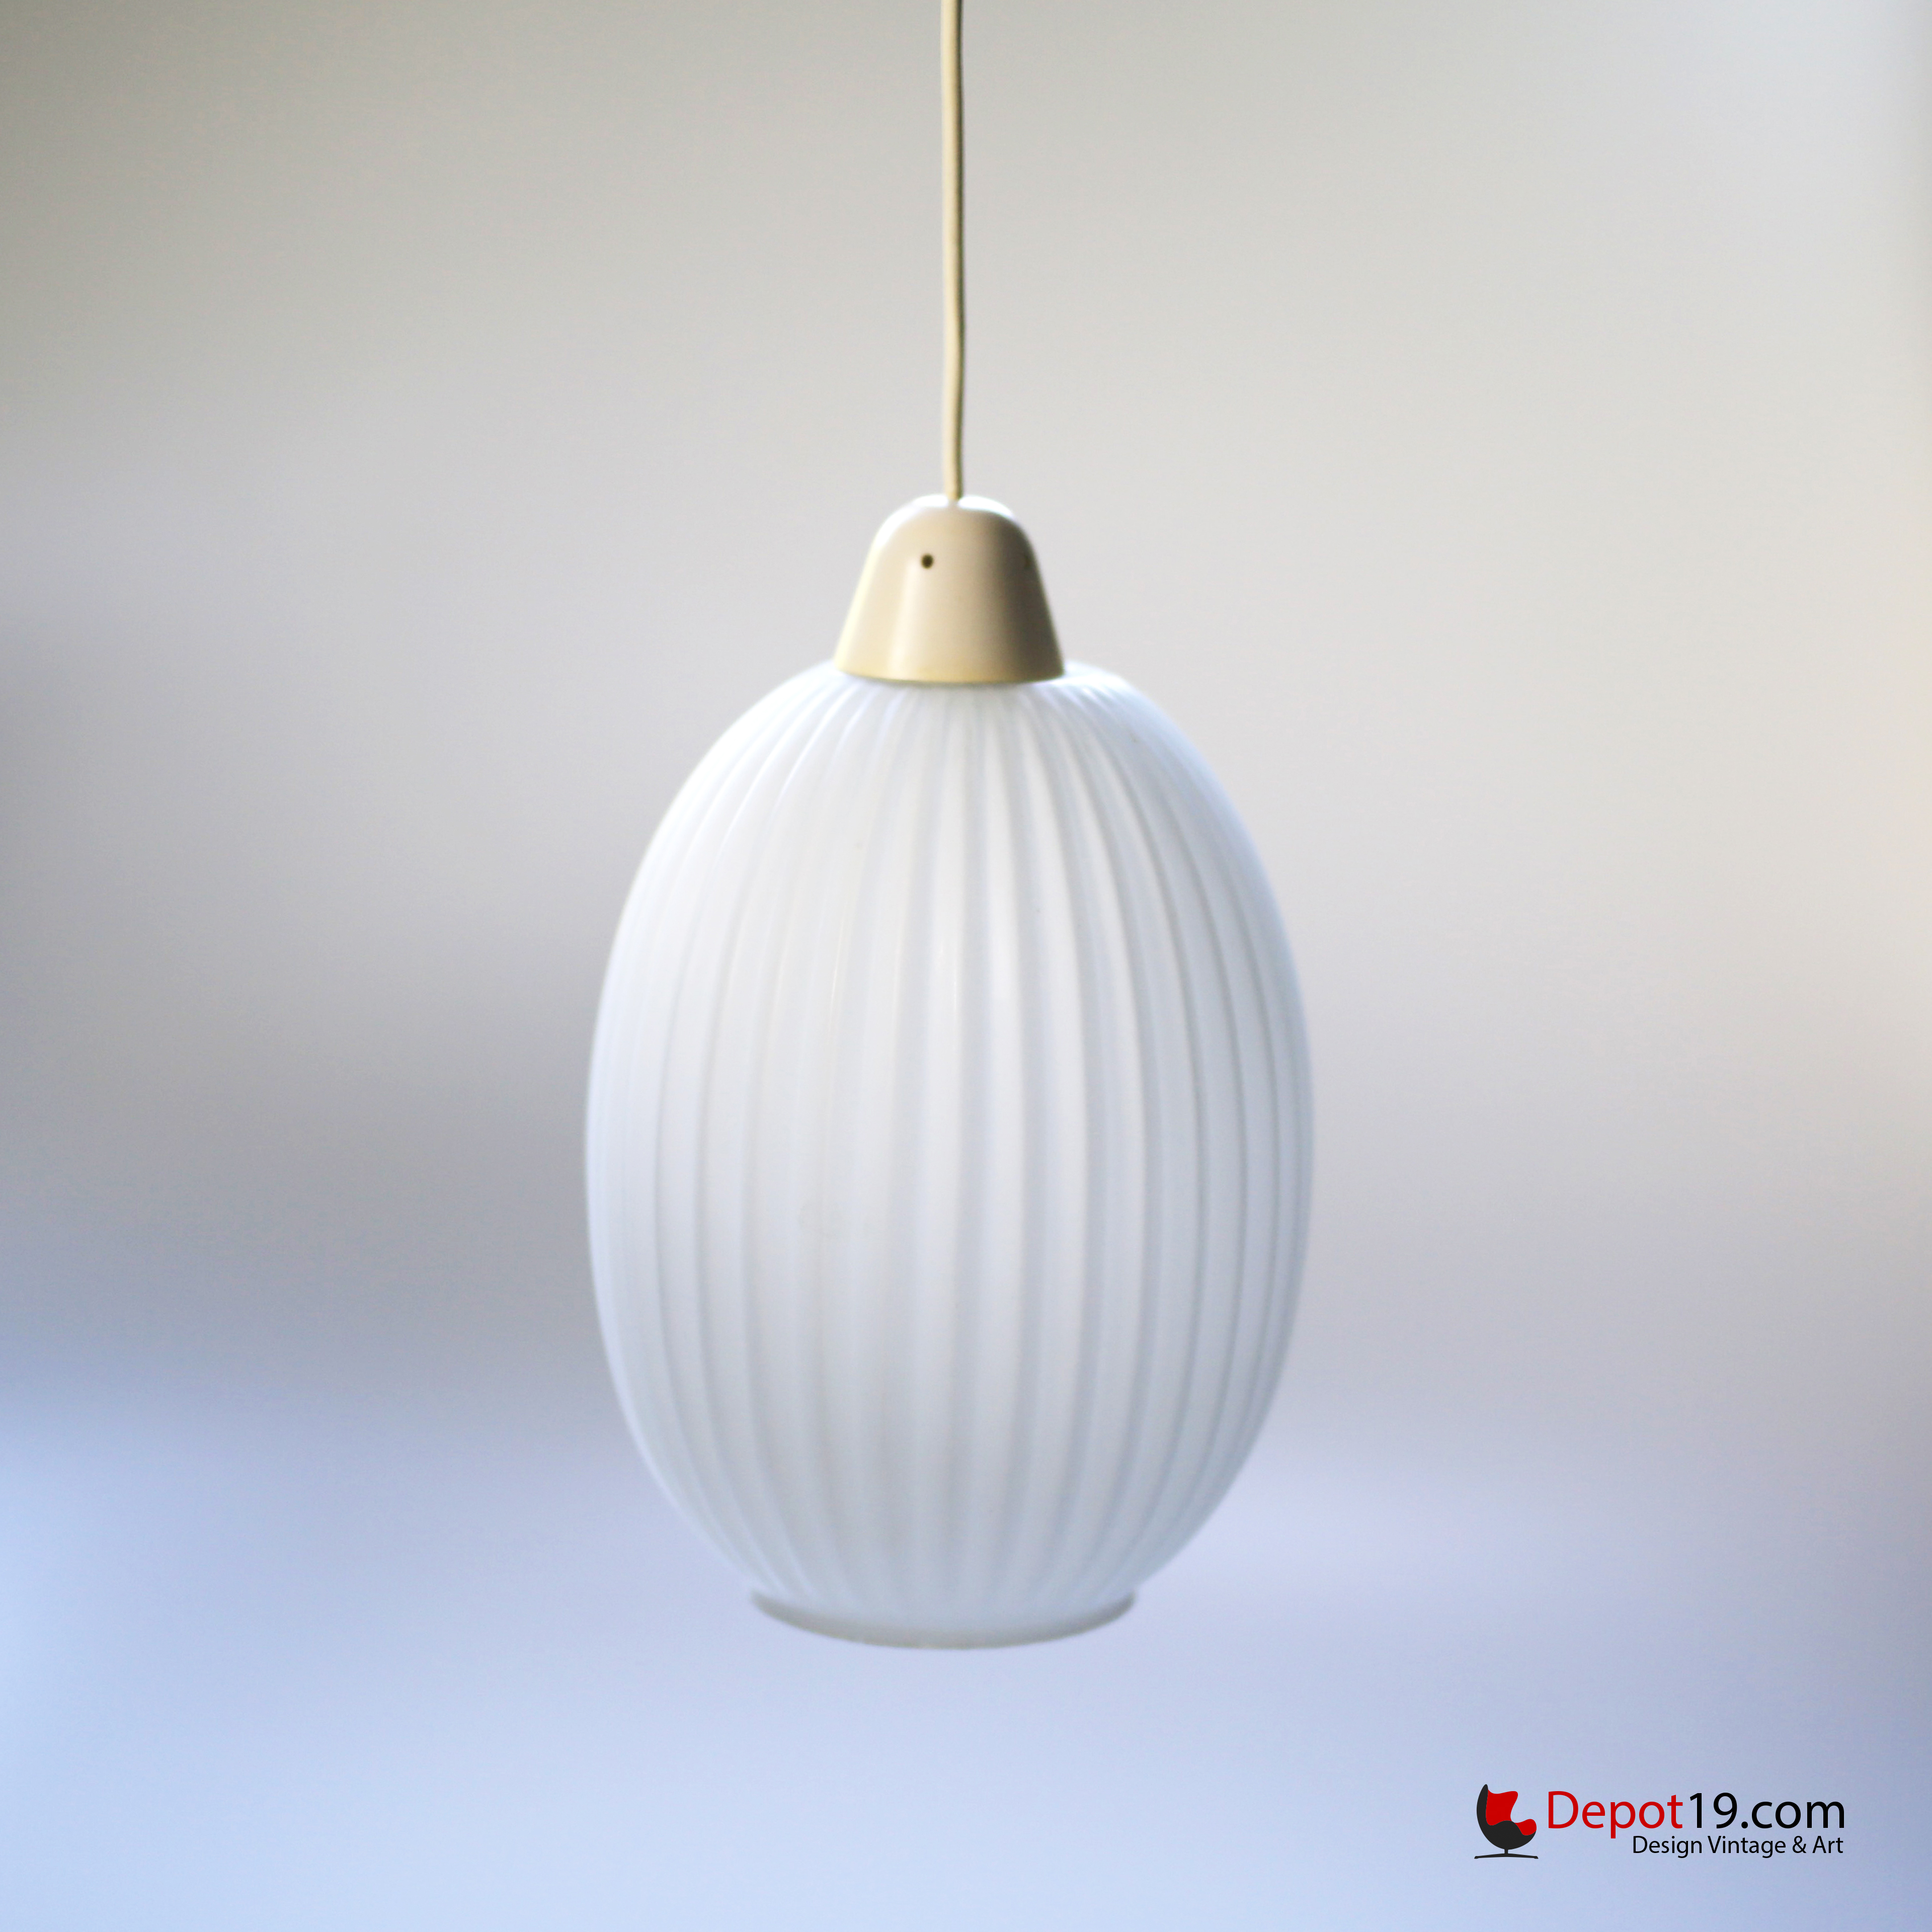 Design Vintage Hanglamp.Vintage Design Lighting Philips Louis Kalff Pendant Lamp